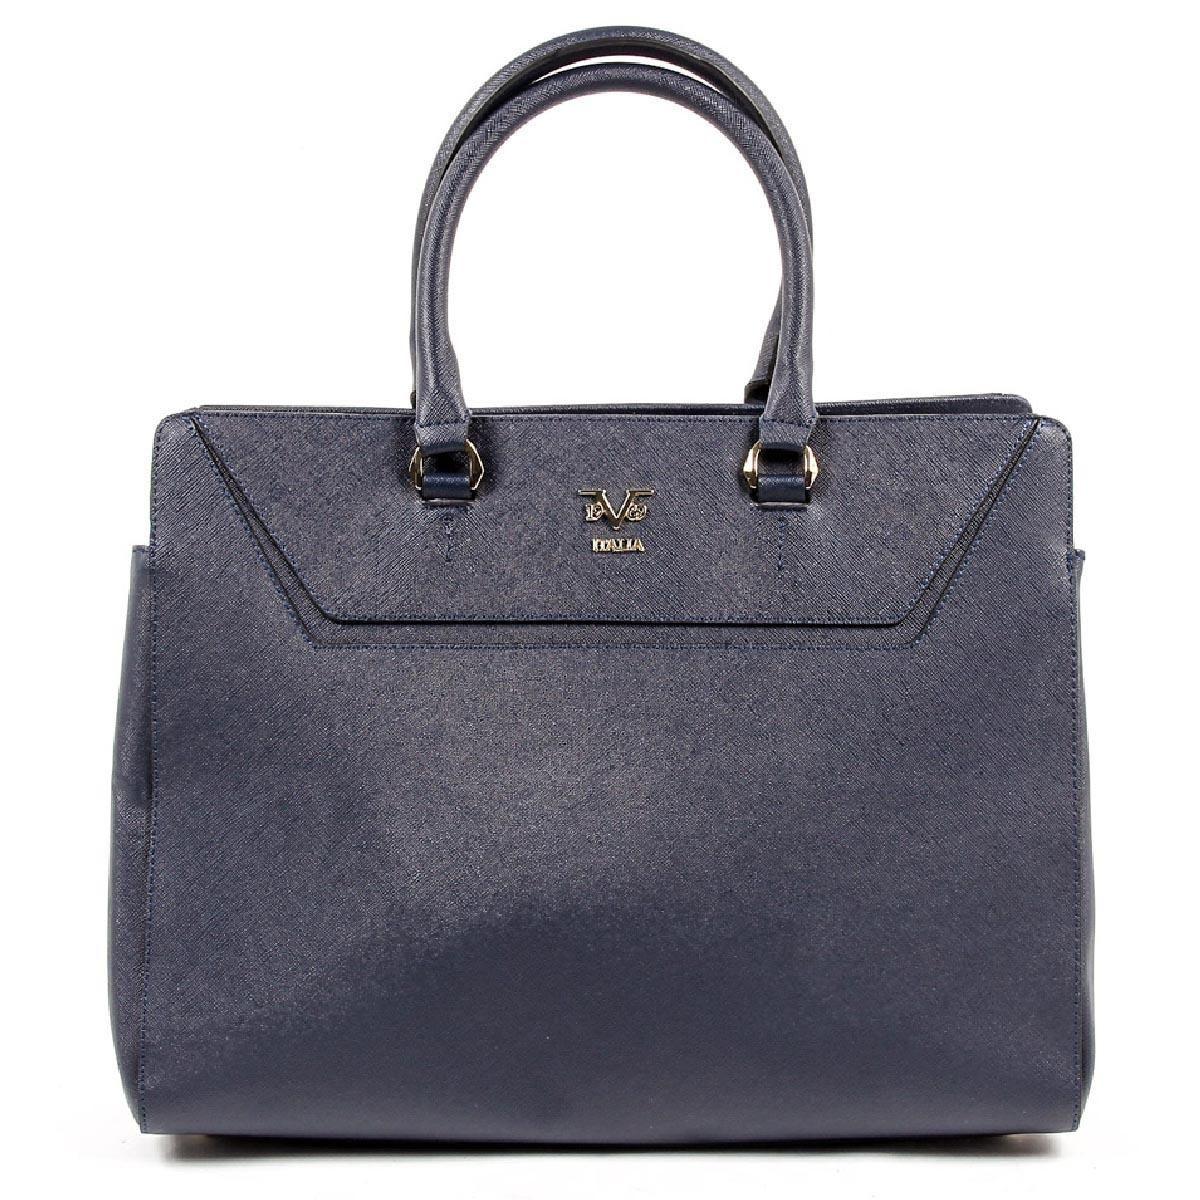 2fcf983646 V 1969 Italia Womens Handbag V1969002 NAVY BLUE. By Versace 19.69 ...